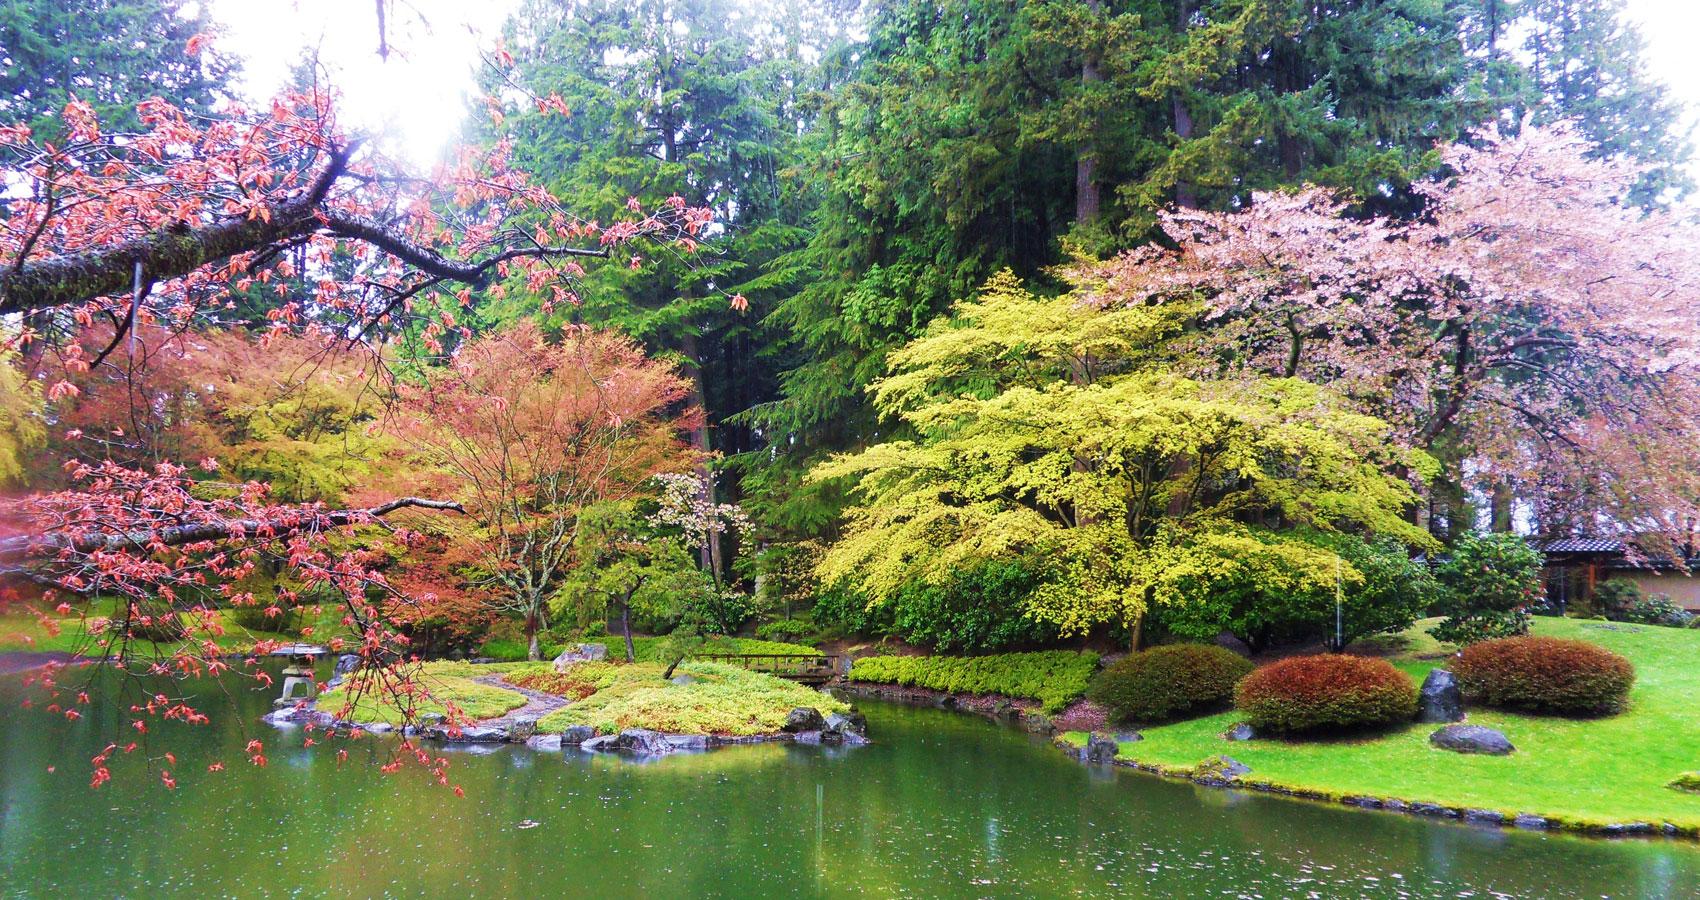 Spring's Moments Of Zen by Charlie Bottle at Spillwords.com